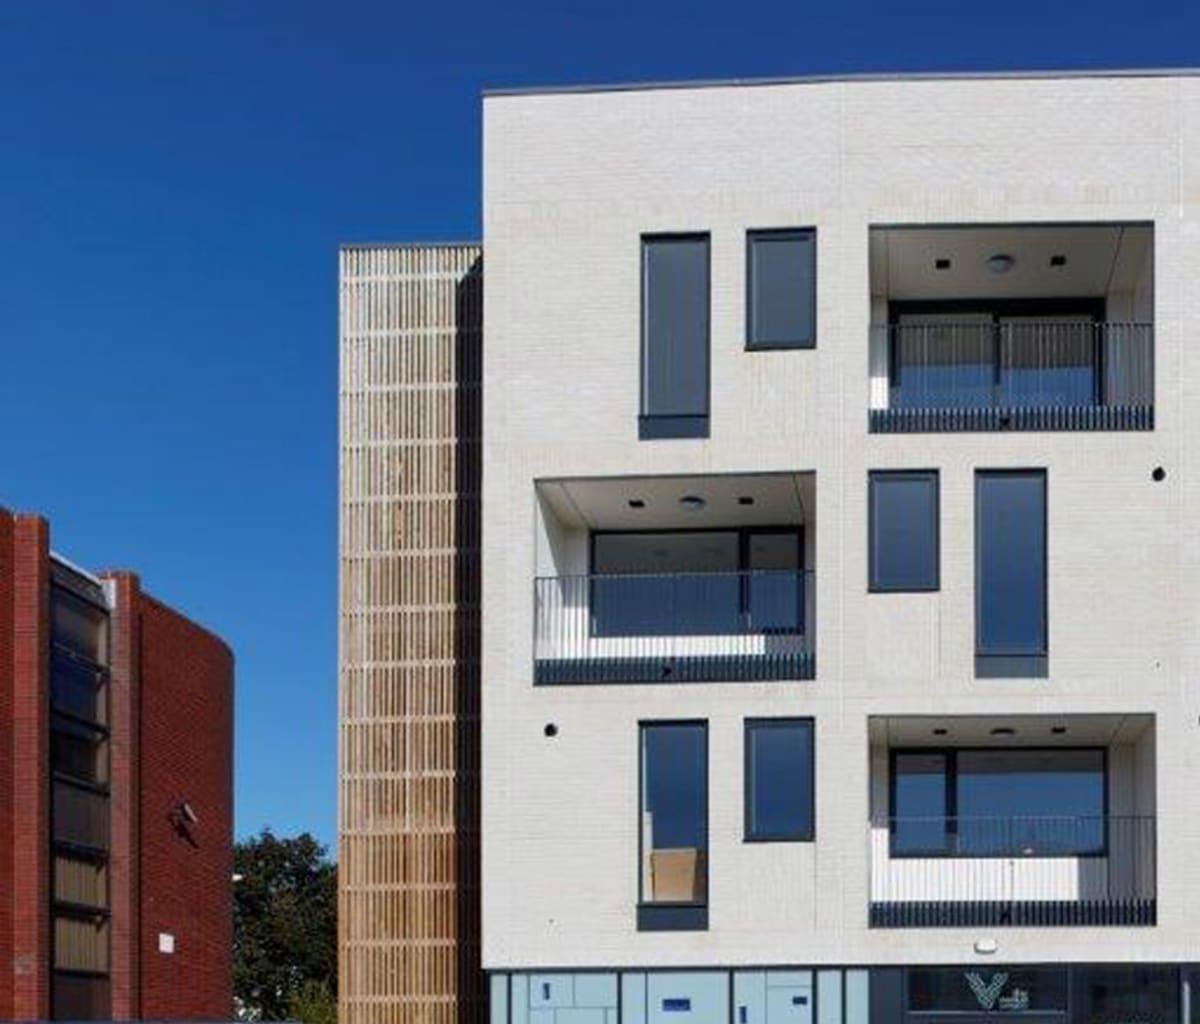 Affordable homes featuring facing bricks